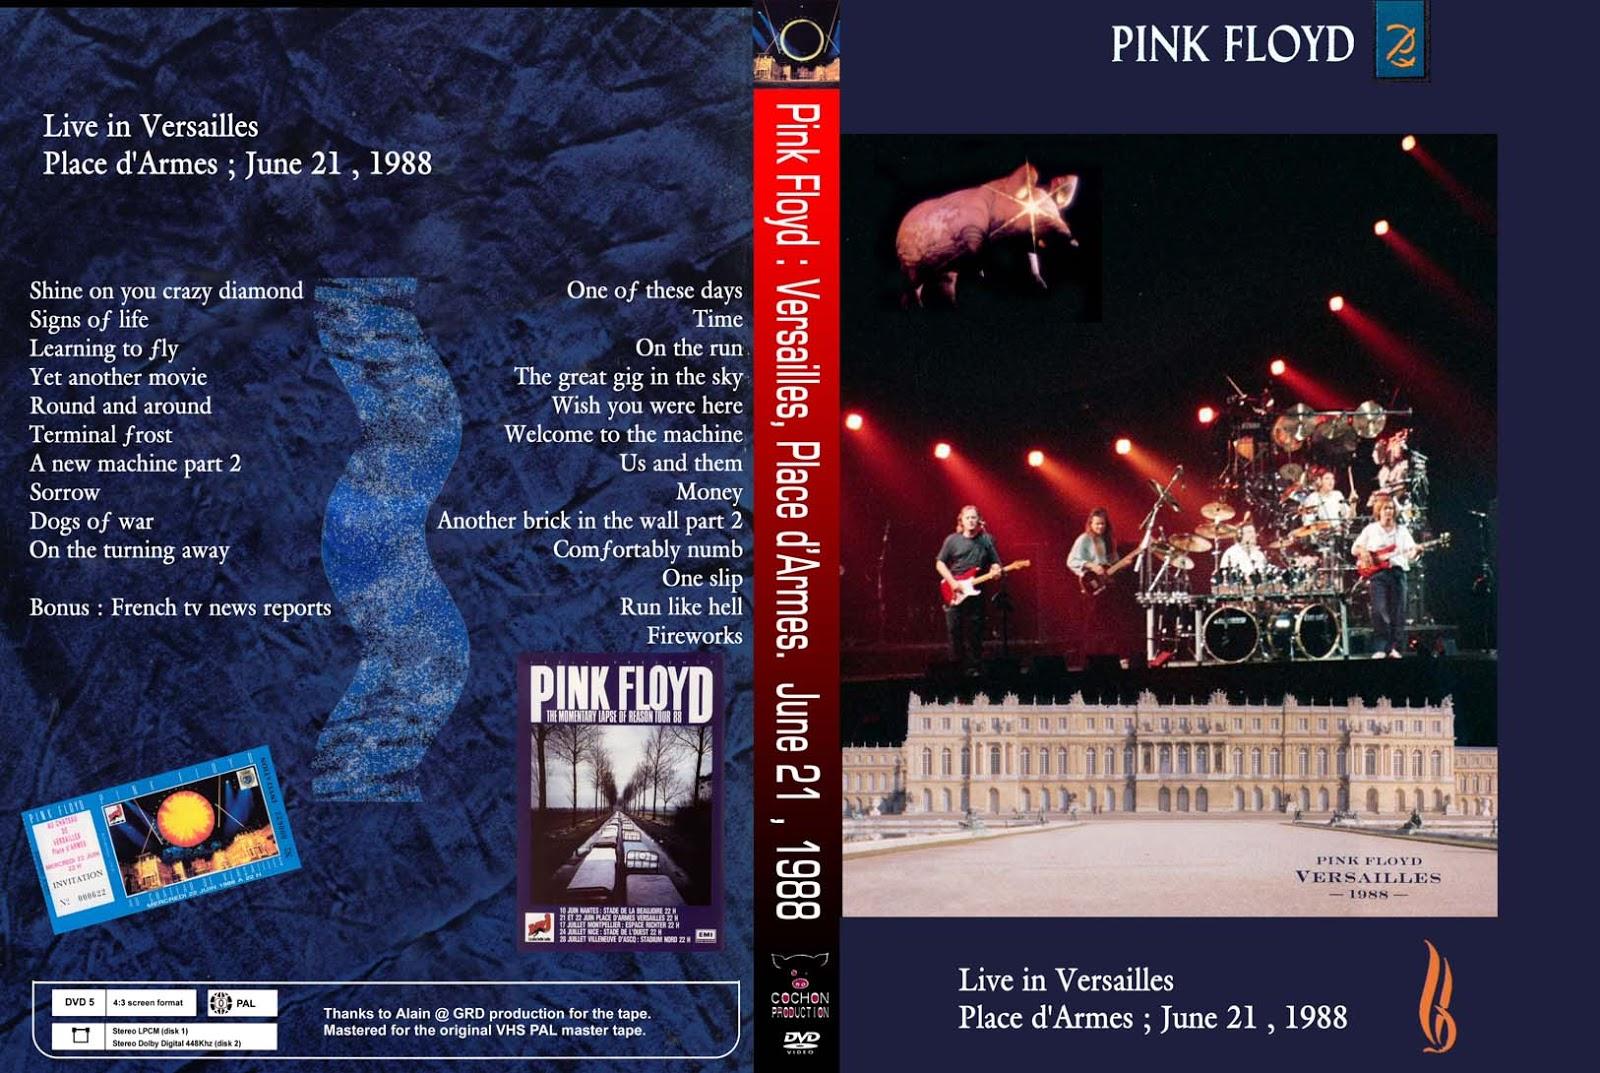 Amazon.com: pink floyd dvd